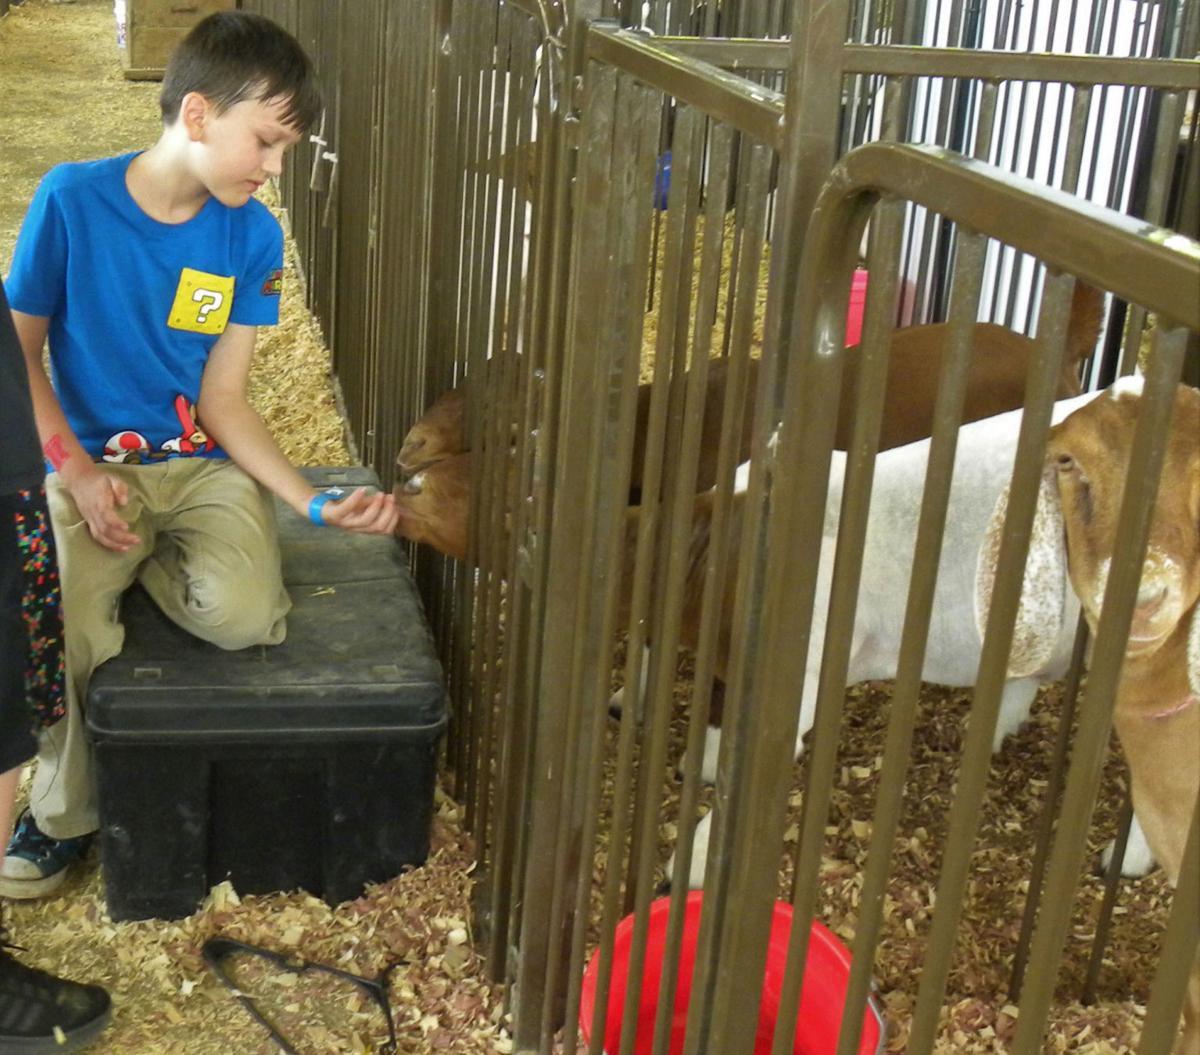 Fair 2019 - Boy and Goats